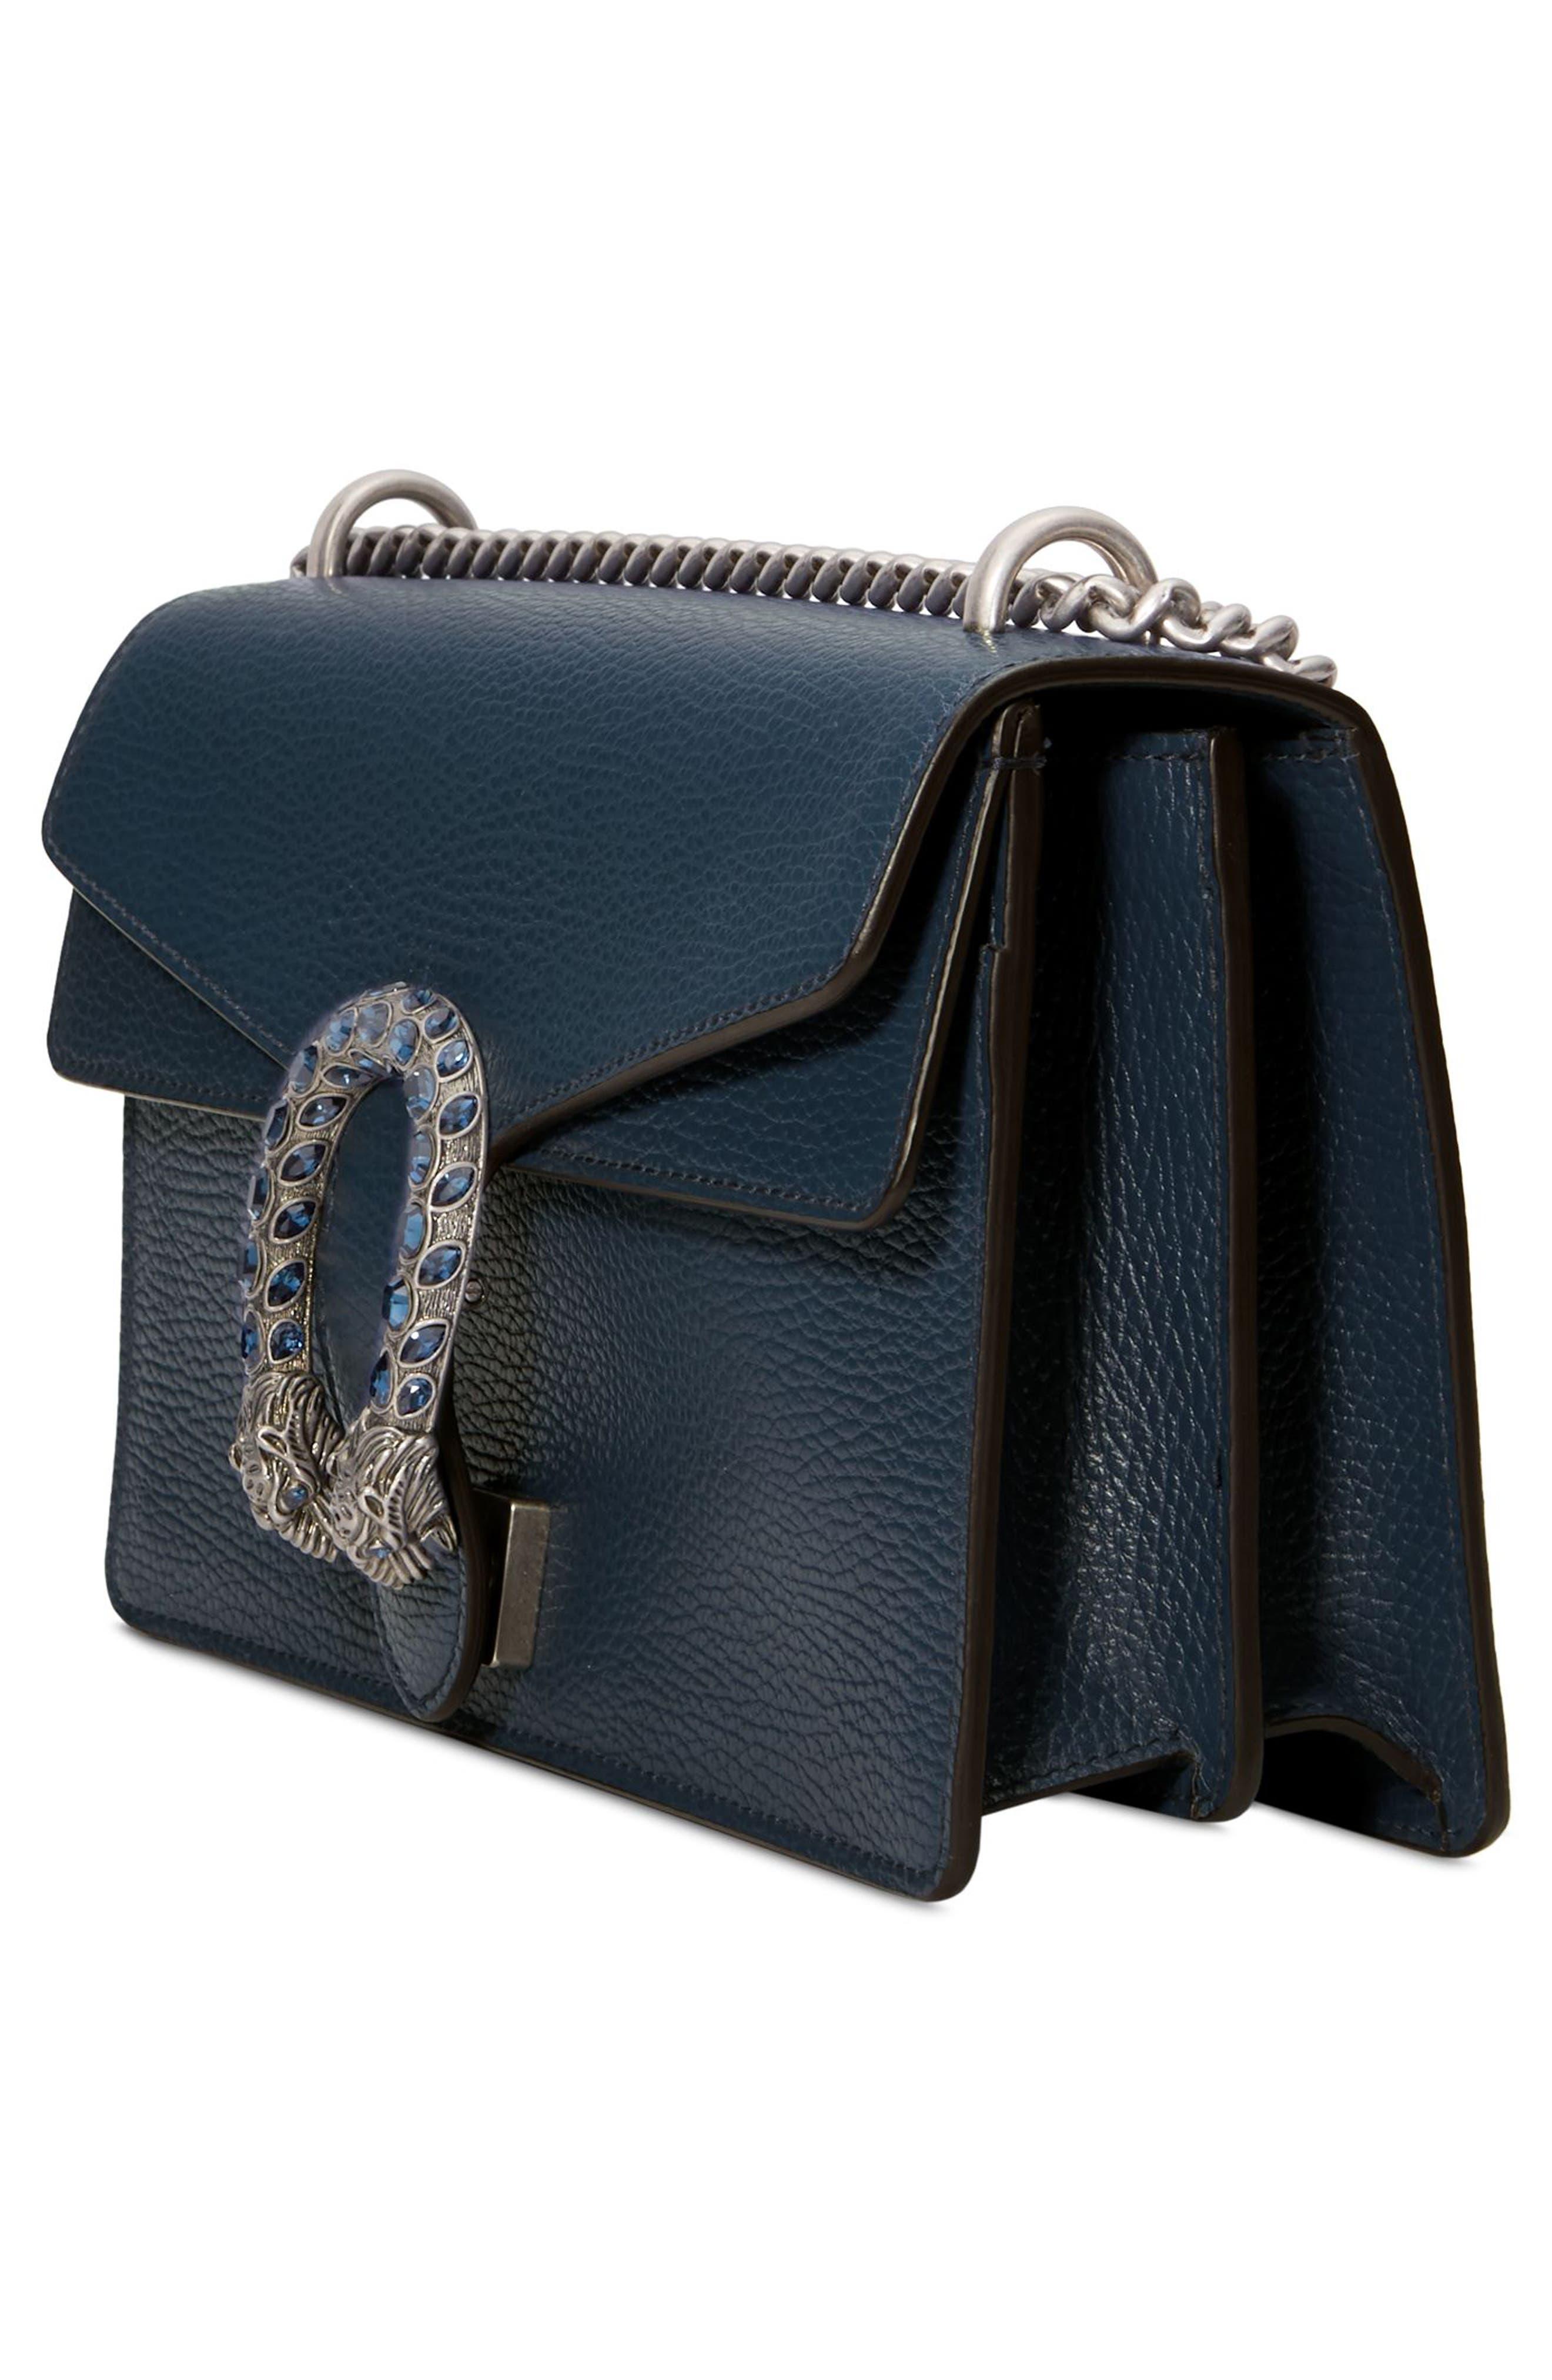 GUCCI, Small Dionysus Leather Shoulder Bag, Alternate thumbnail 4, color, BLU AGATA/ MONTANA